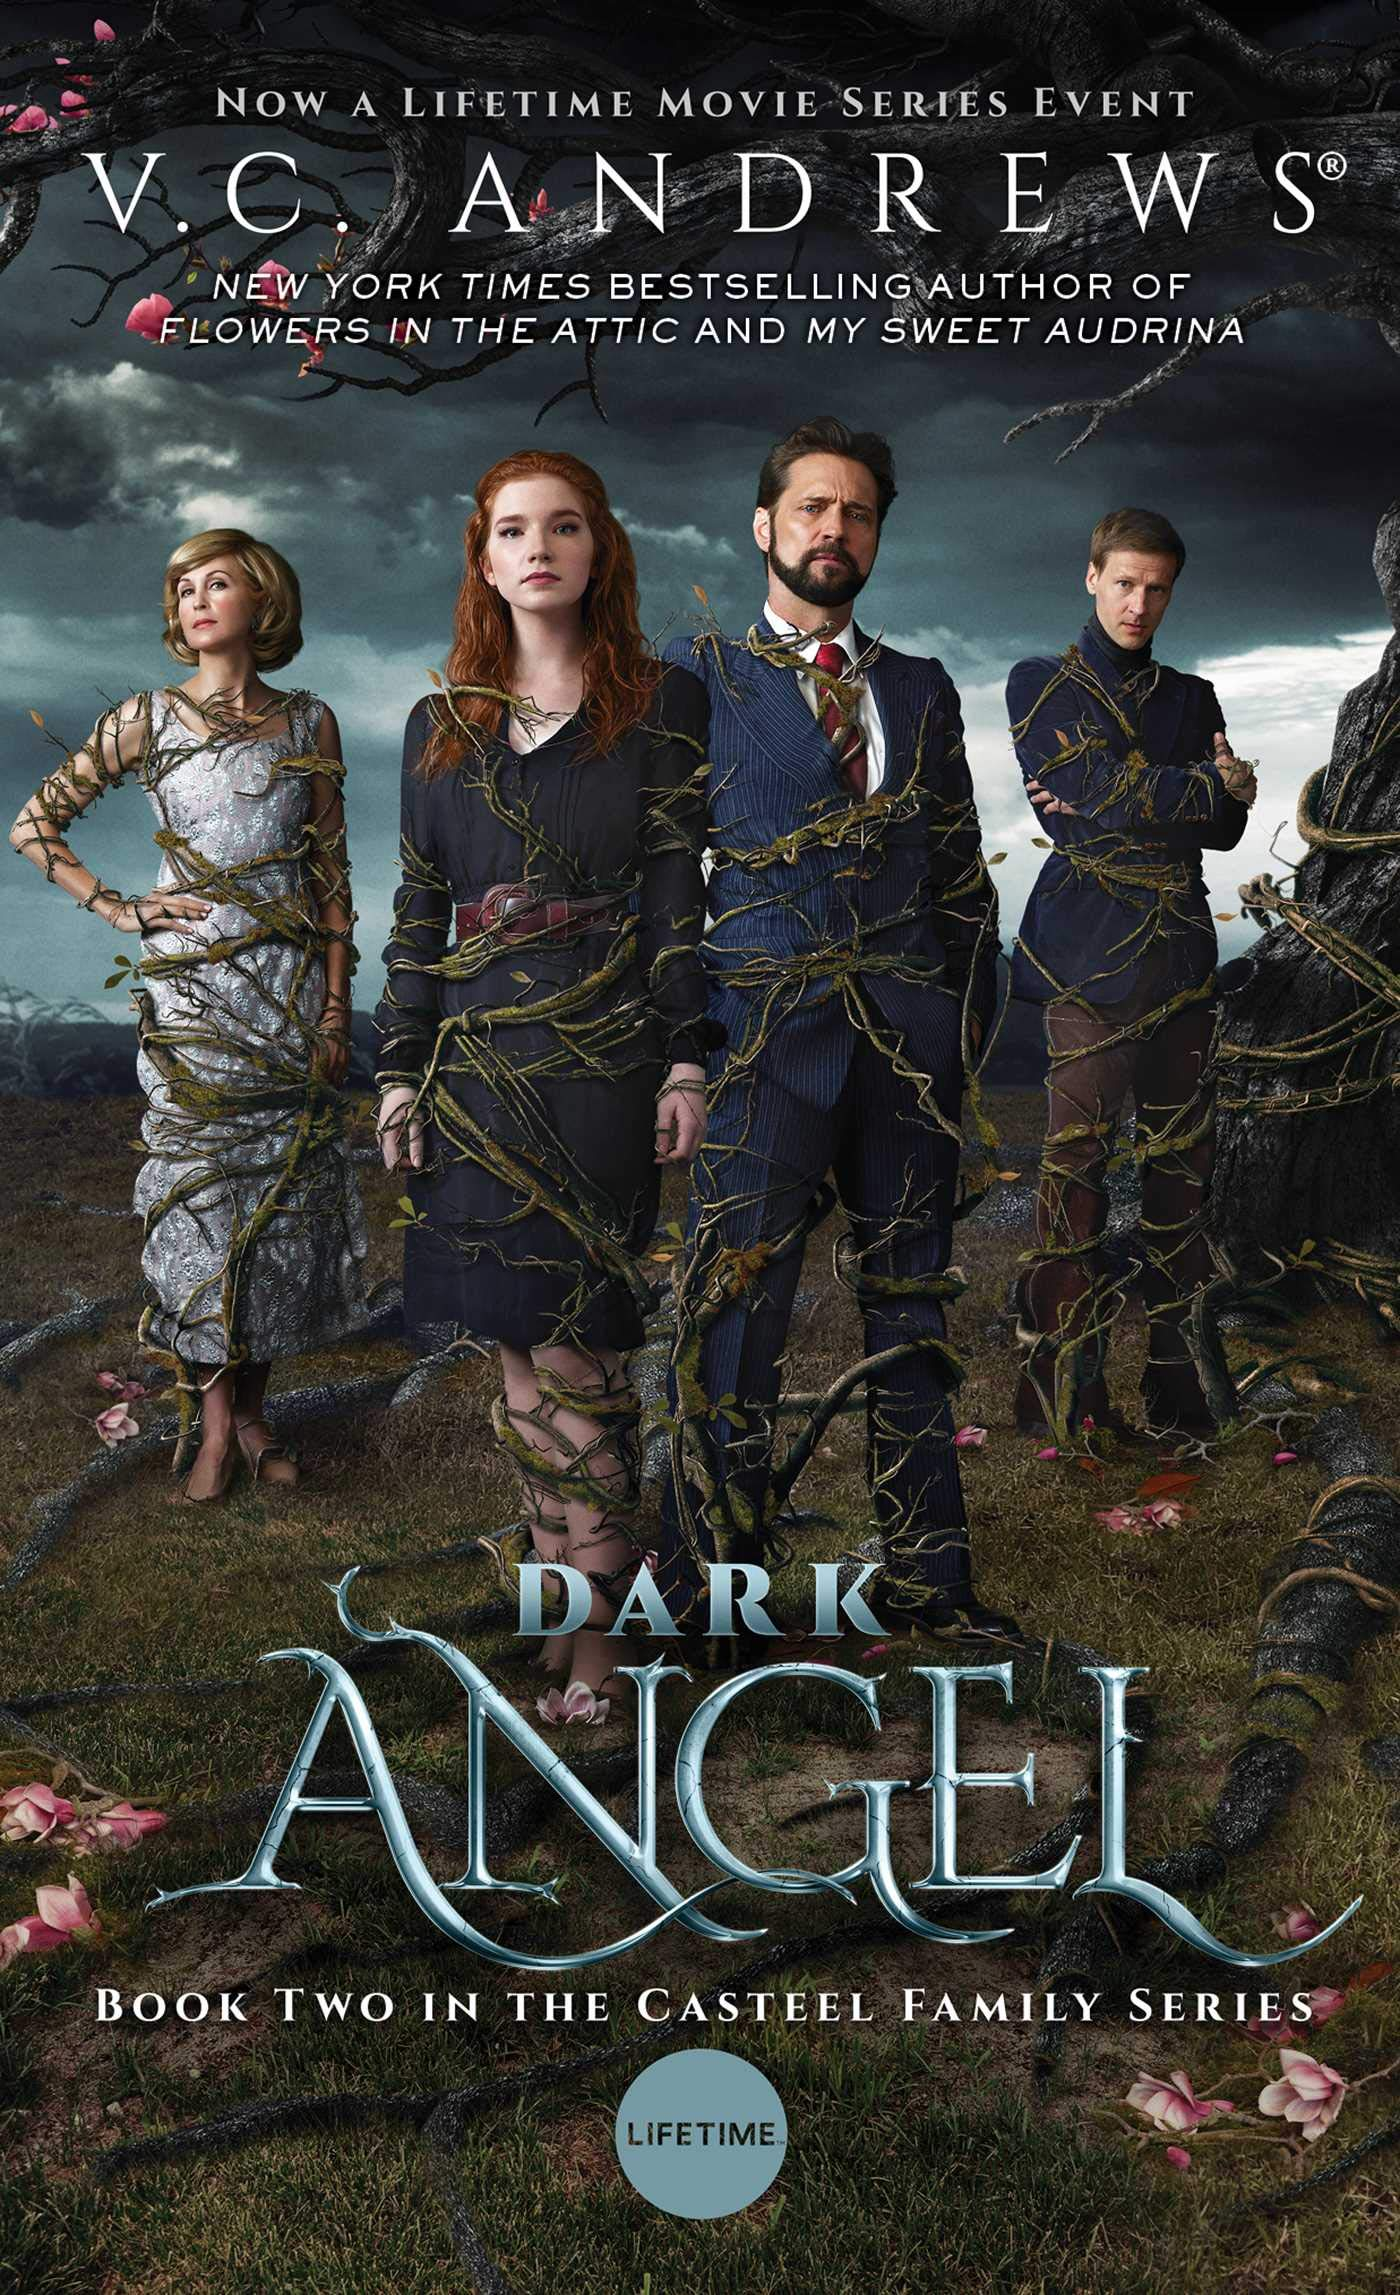 Pelicula porno angels V C Andrews Dark Angel 2019 Lifetime Lifetime Uncorked